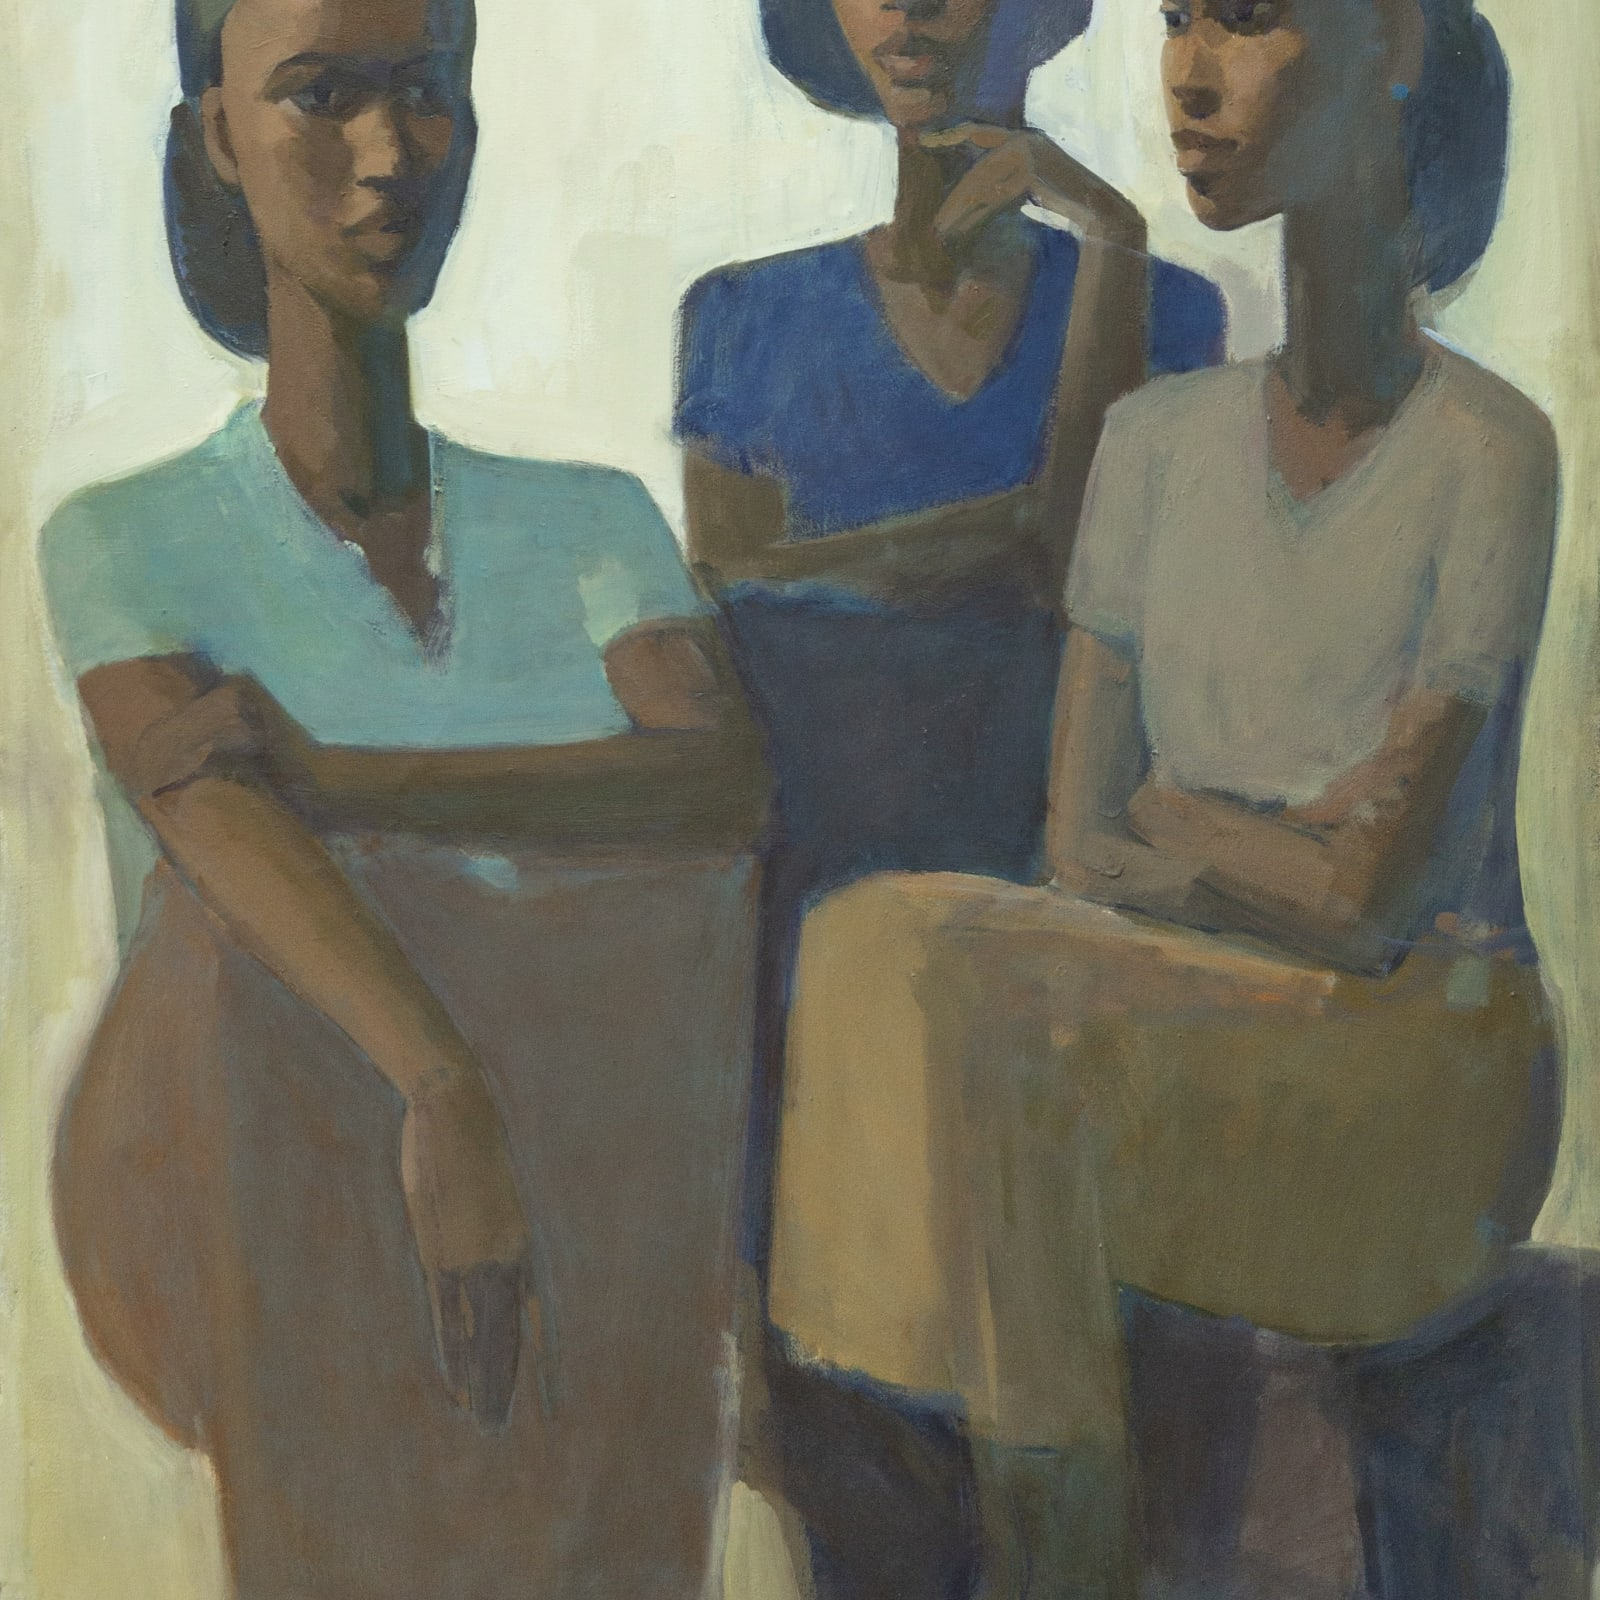 Tadesse Mesfin Pillars of Life: Guleet II, 2019